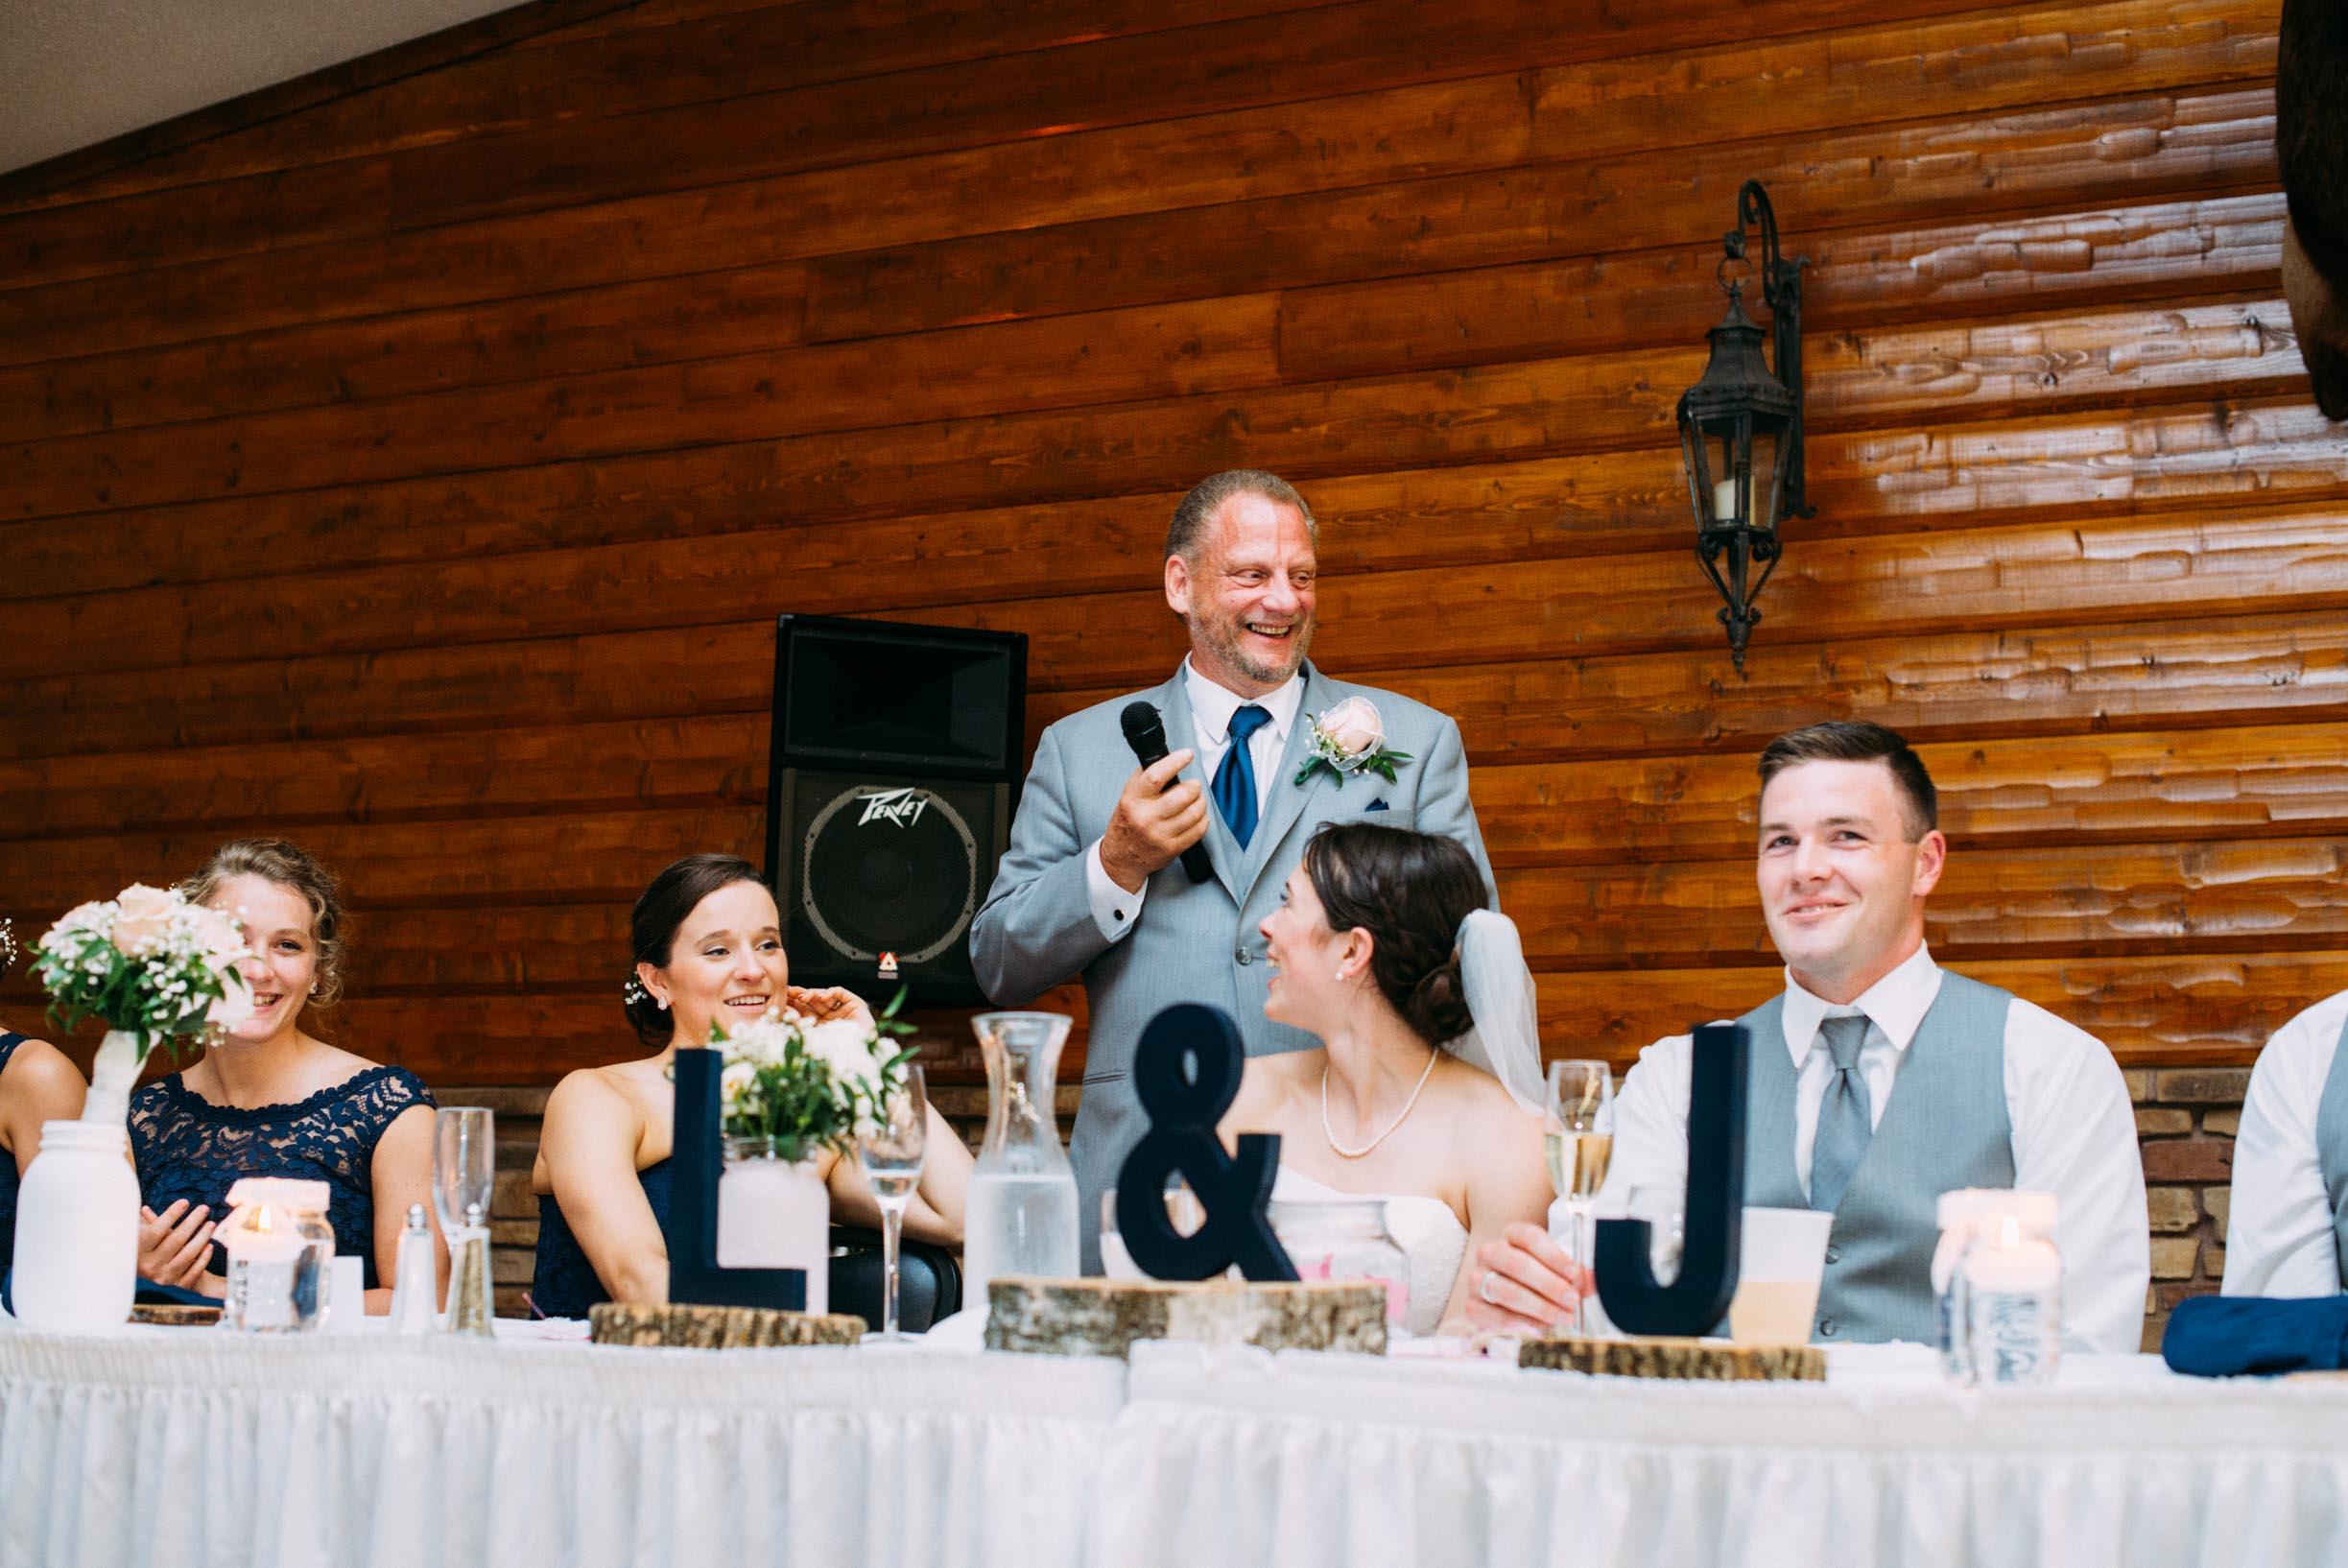 37-Lindsey Jake Wedding Reception Winona_.jpg